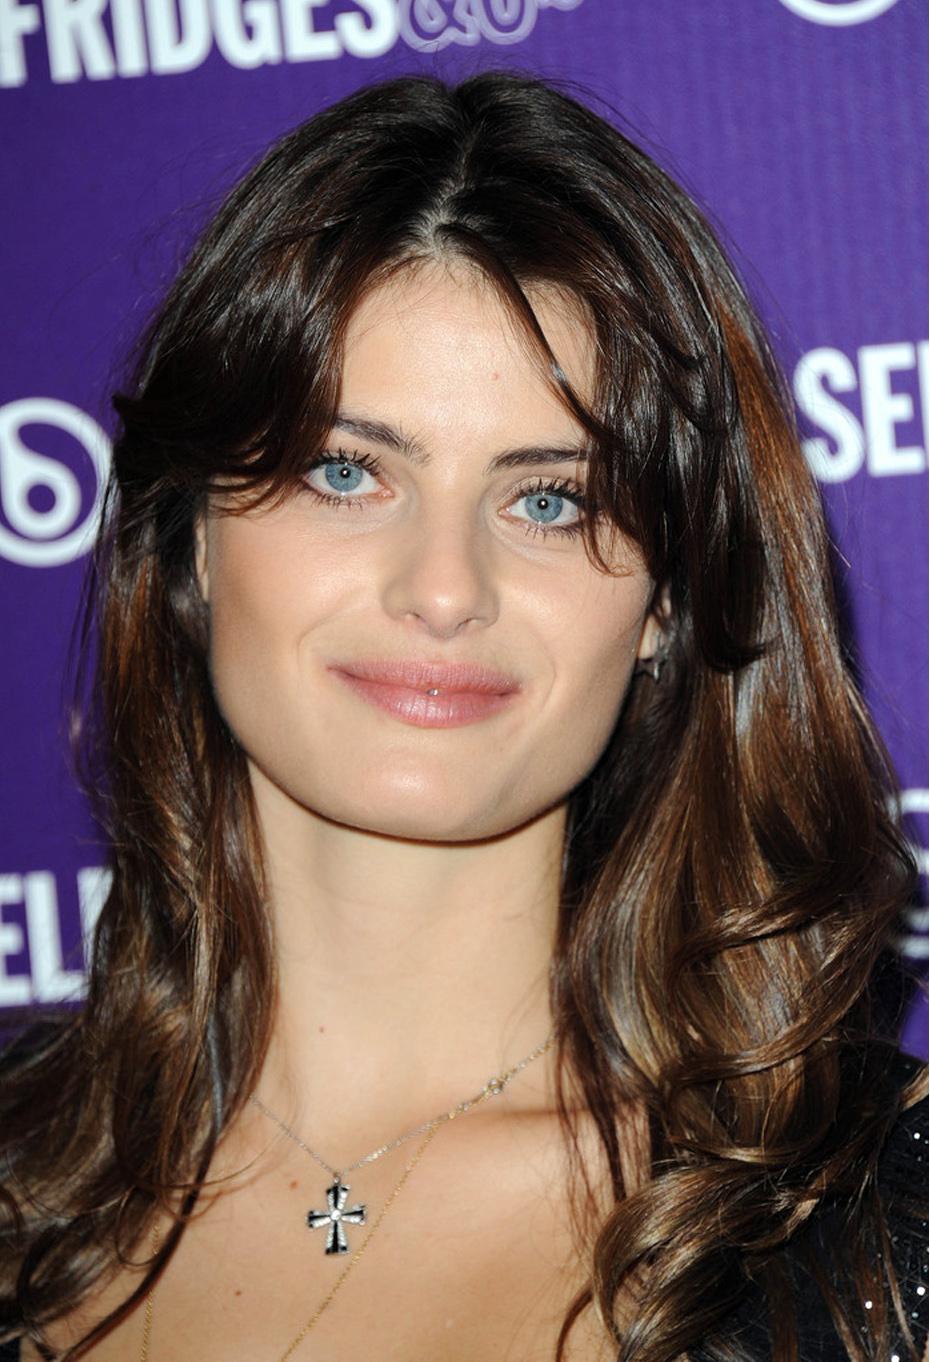 Isabelli Fontana Beautyline 9